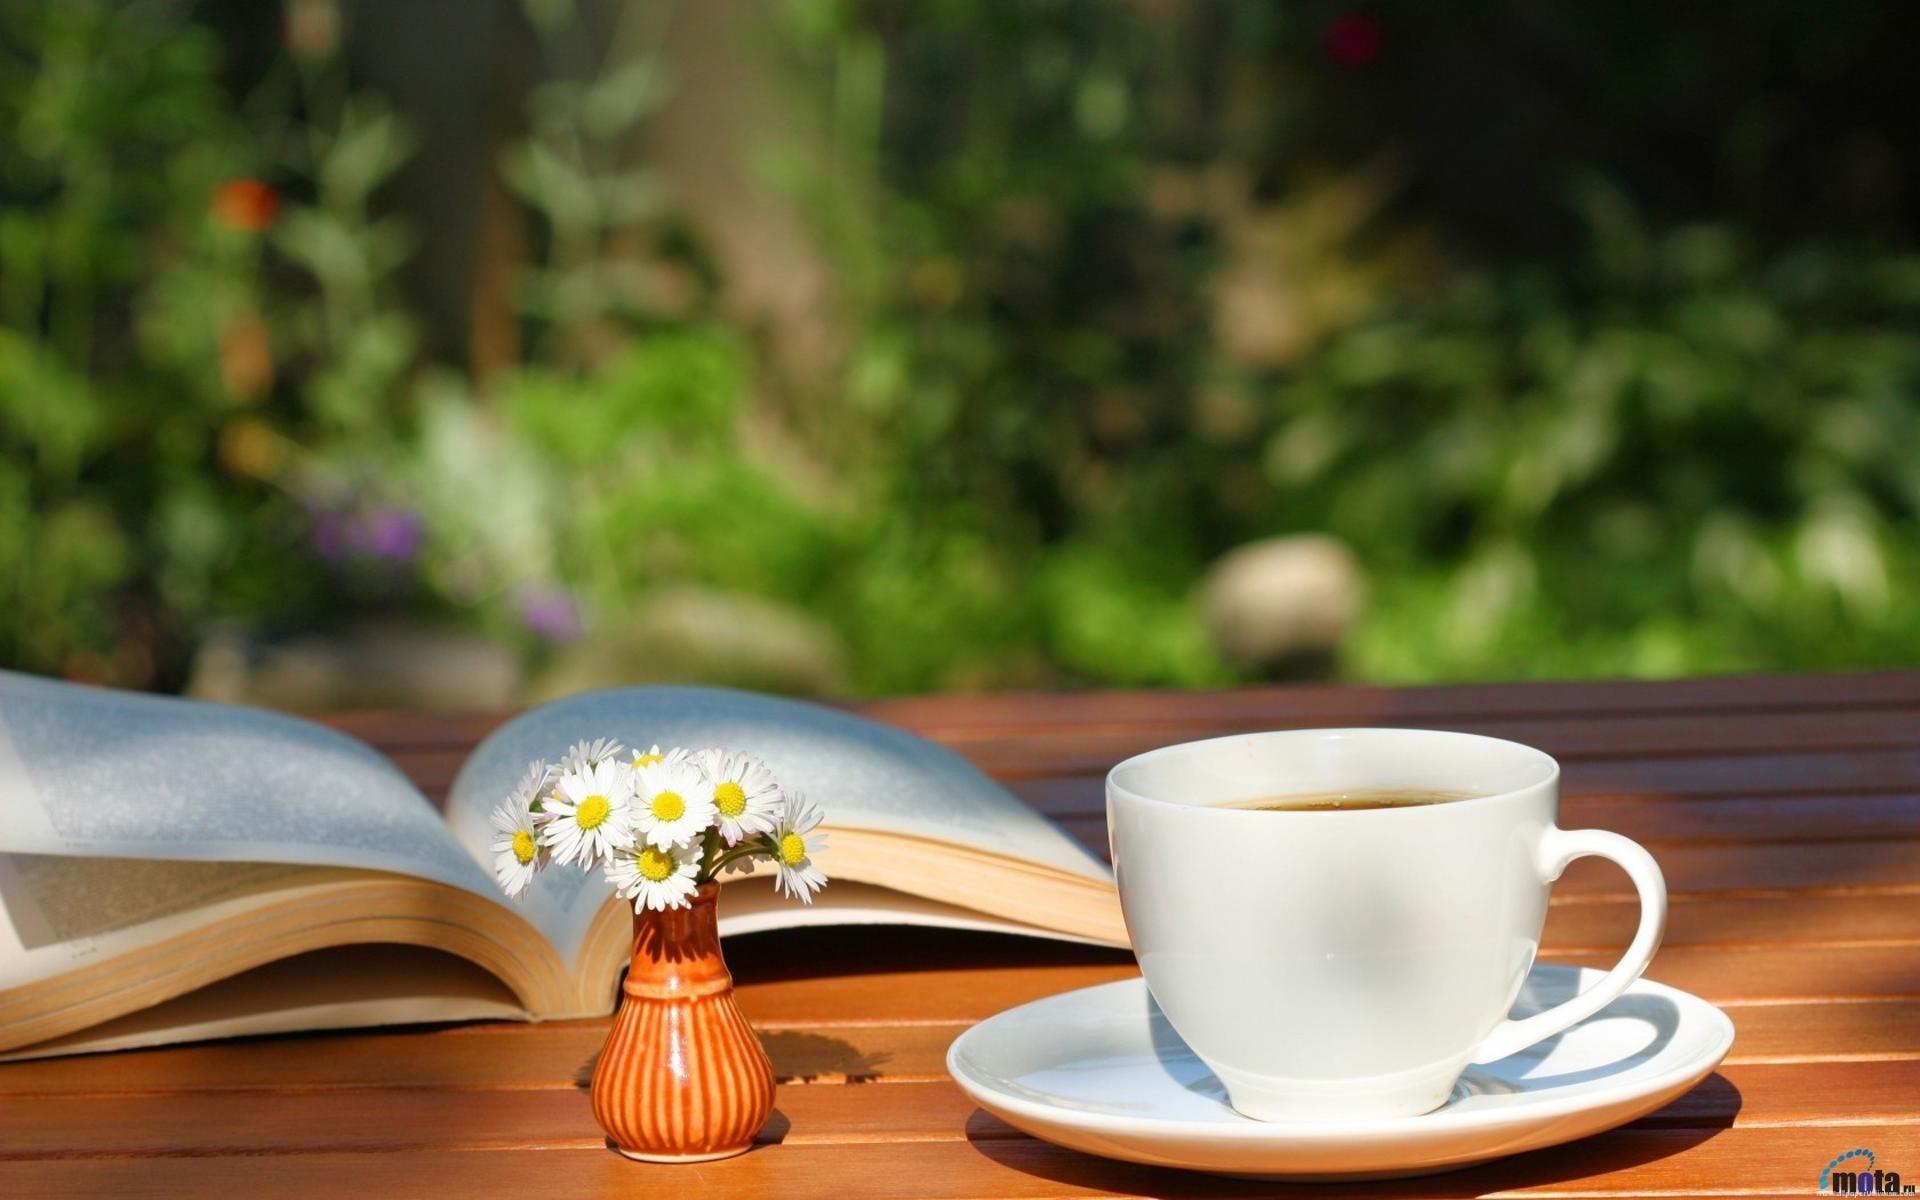 Books Background 183 ① Download Free Stunning High Resolution